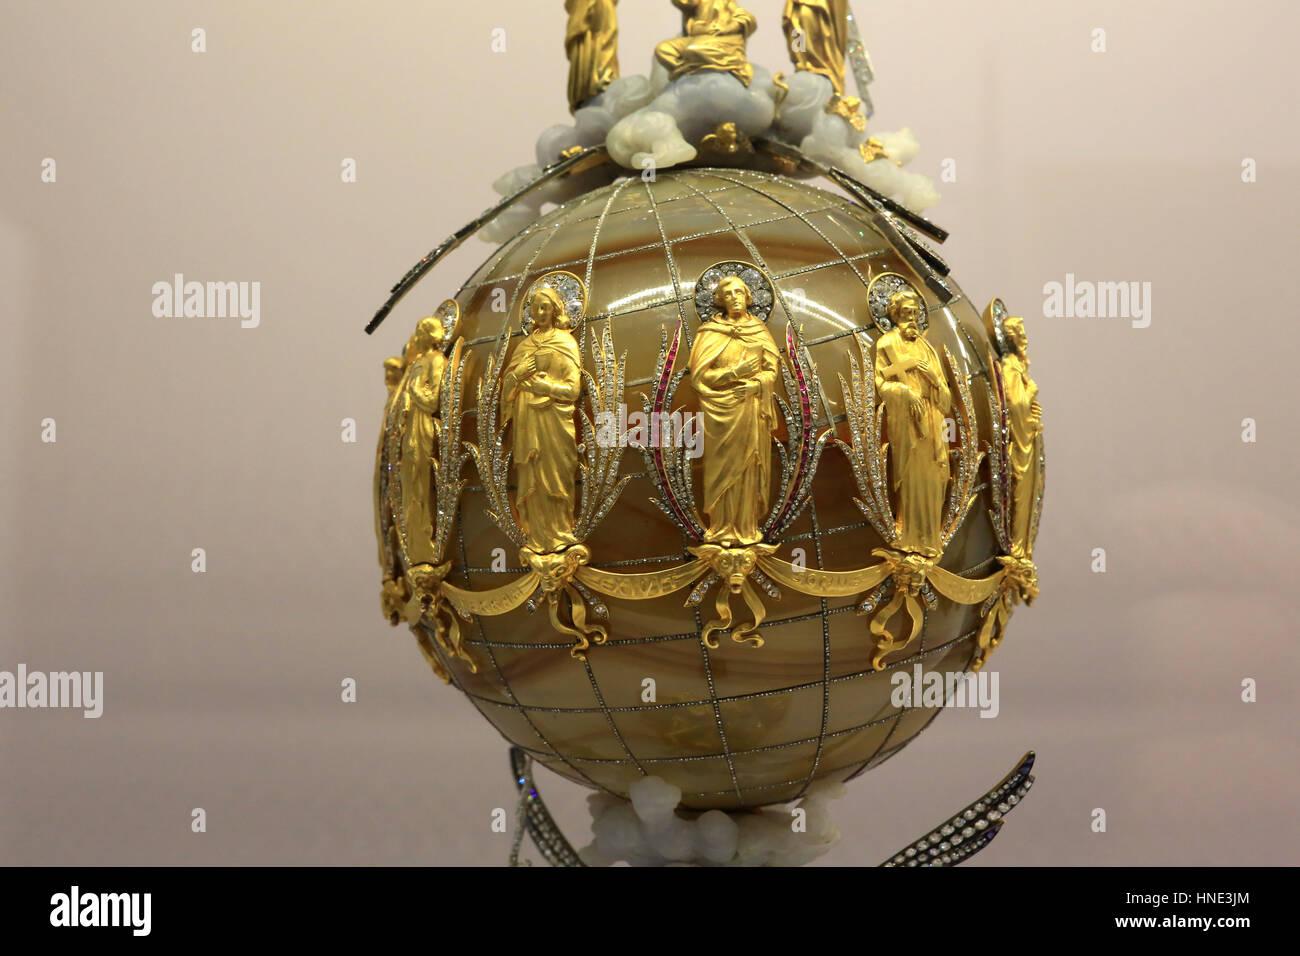 Hieron Museum. Détails. Christus Vincit. Joseph Chaumet. Or, diamans, saphir, rubis, jade, agathe, labradorite. Stock Photo